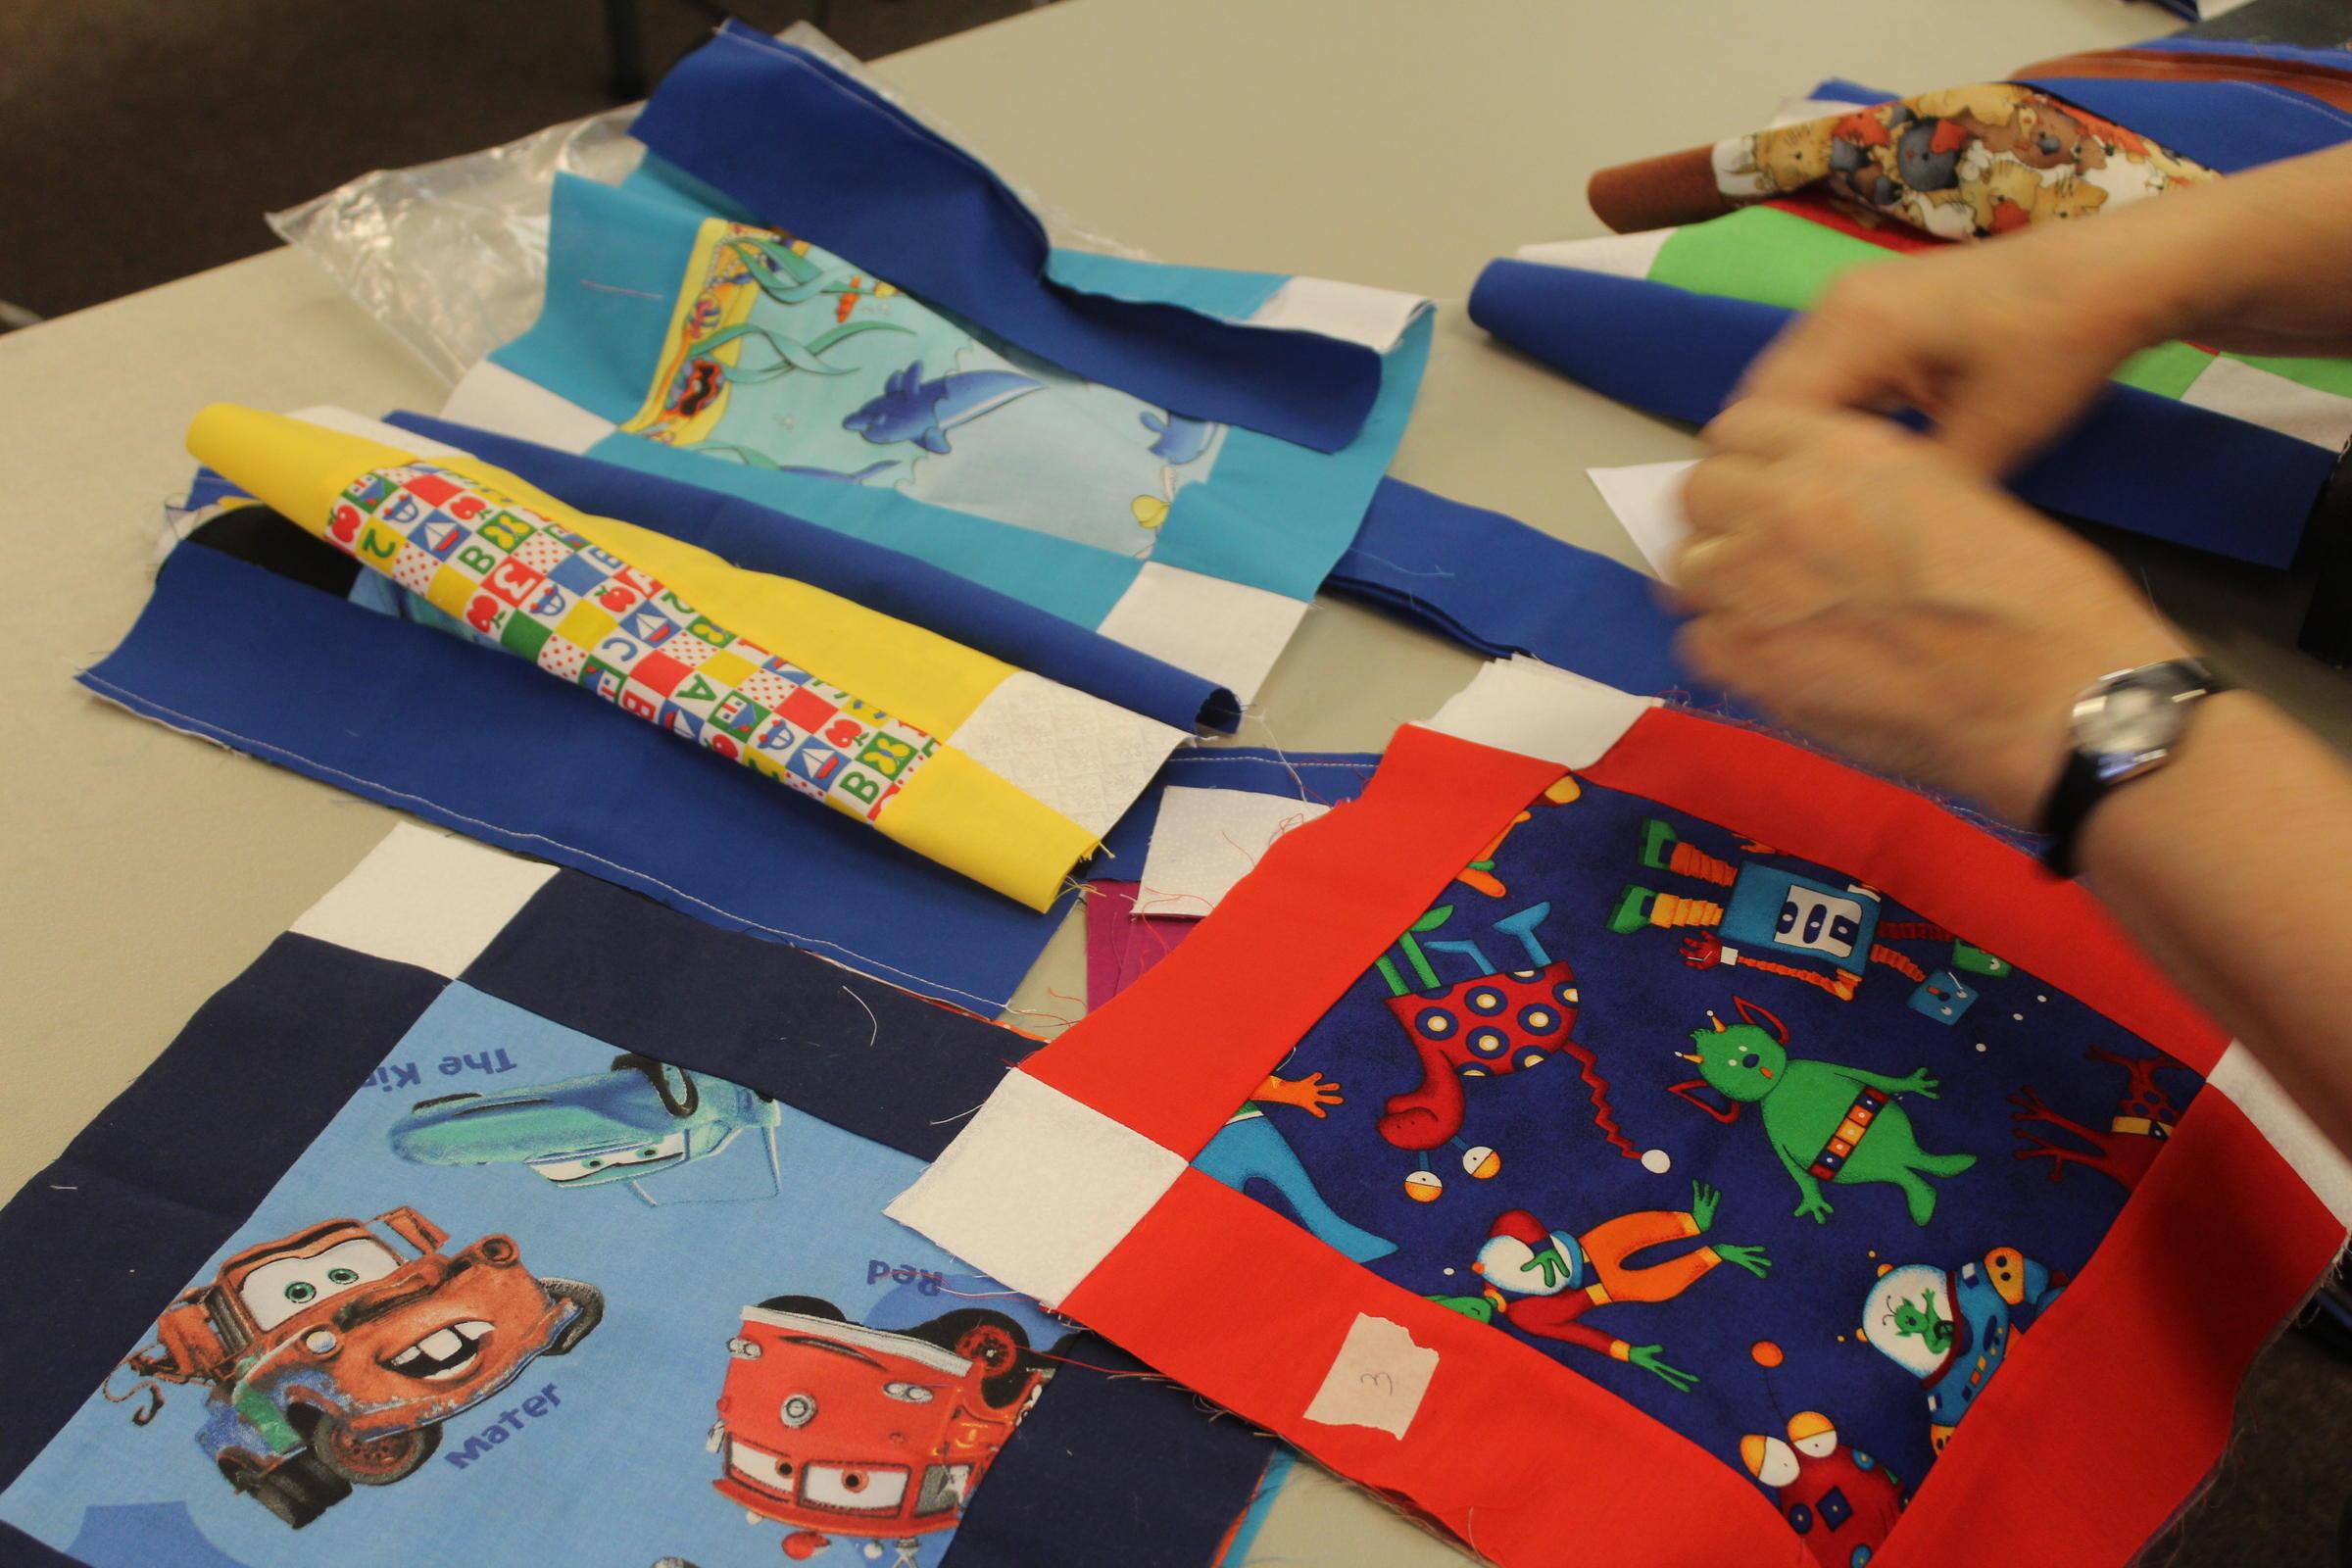 Handmade Quilts Help Comfort Kids Ksmu Radio